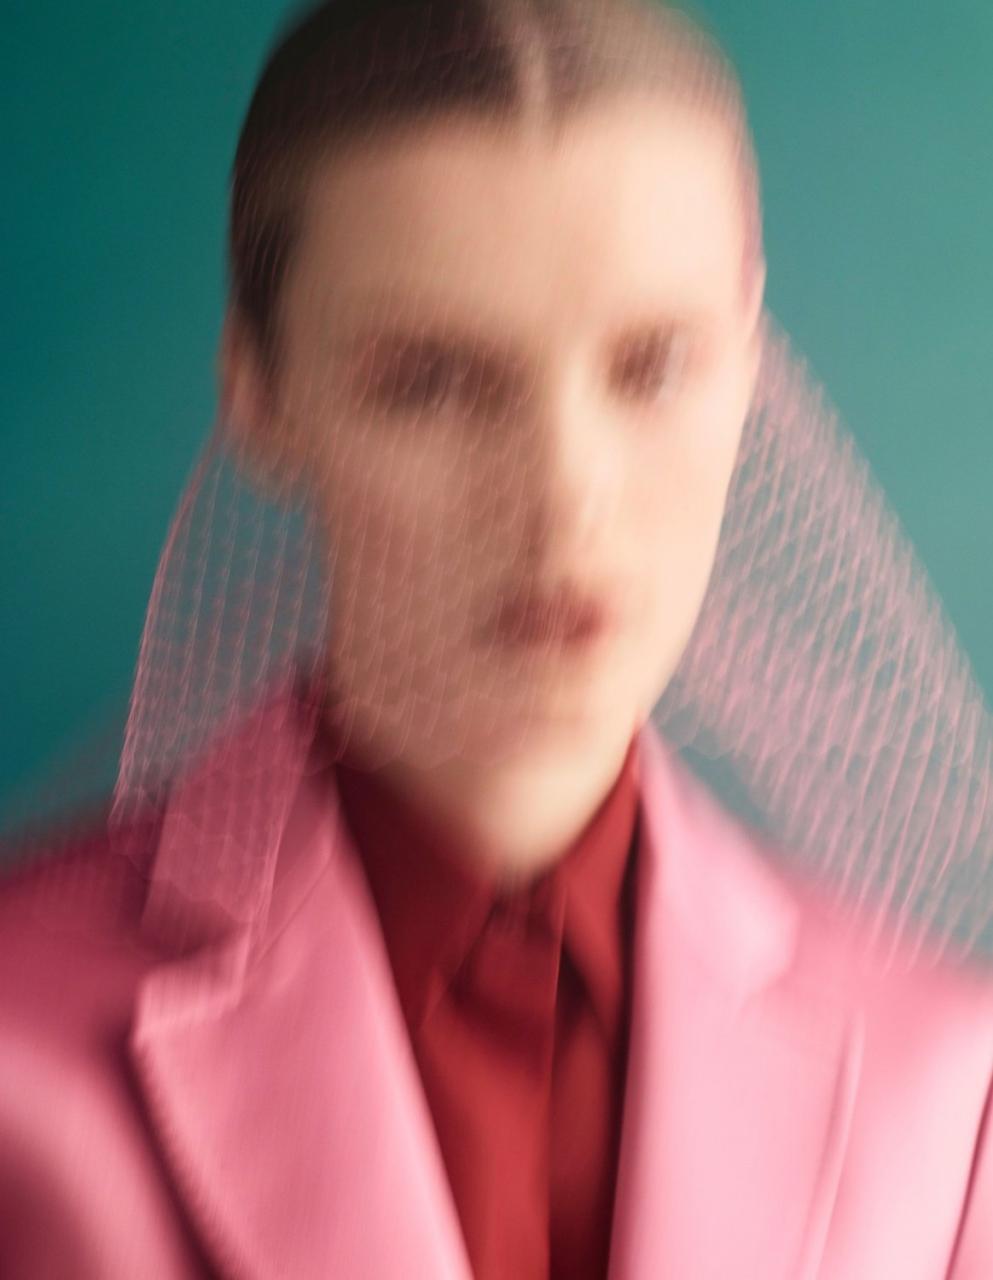 《VOGUE》中国版2019年1月刊 超模Kris Grikaite出镜 时尚图库 第1张